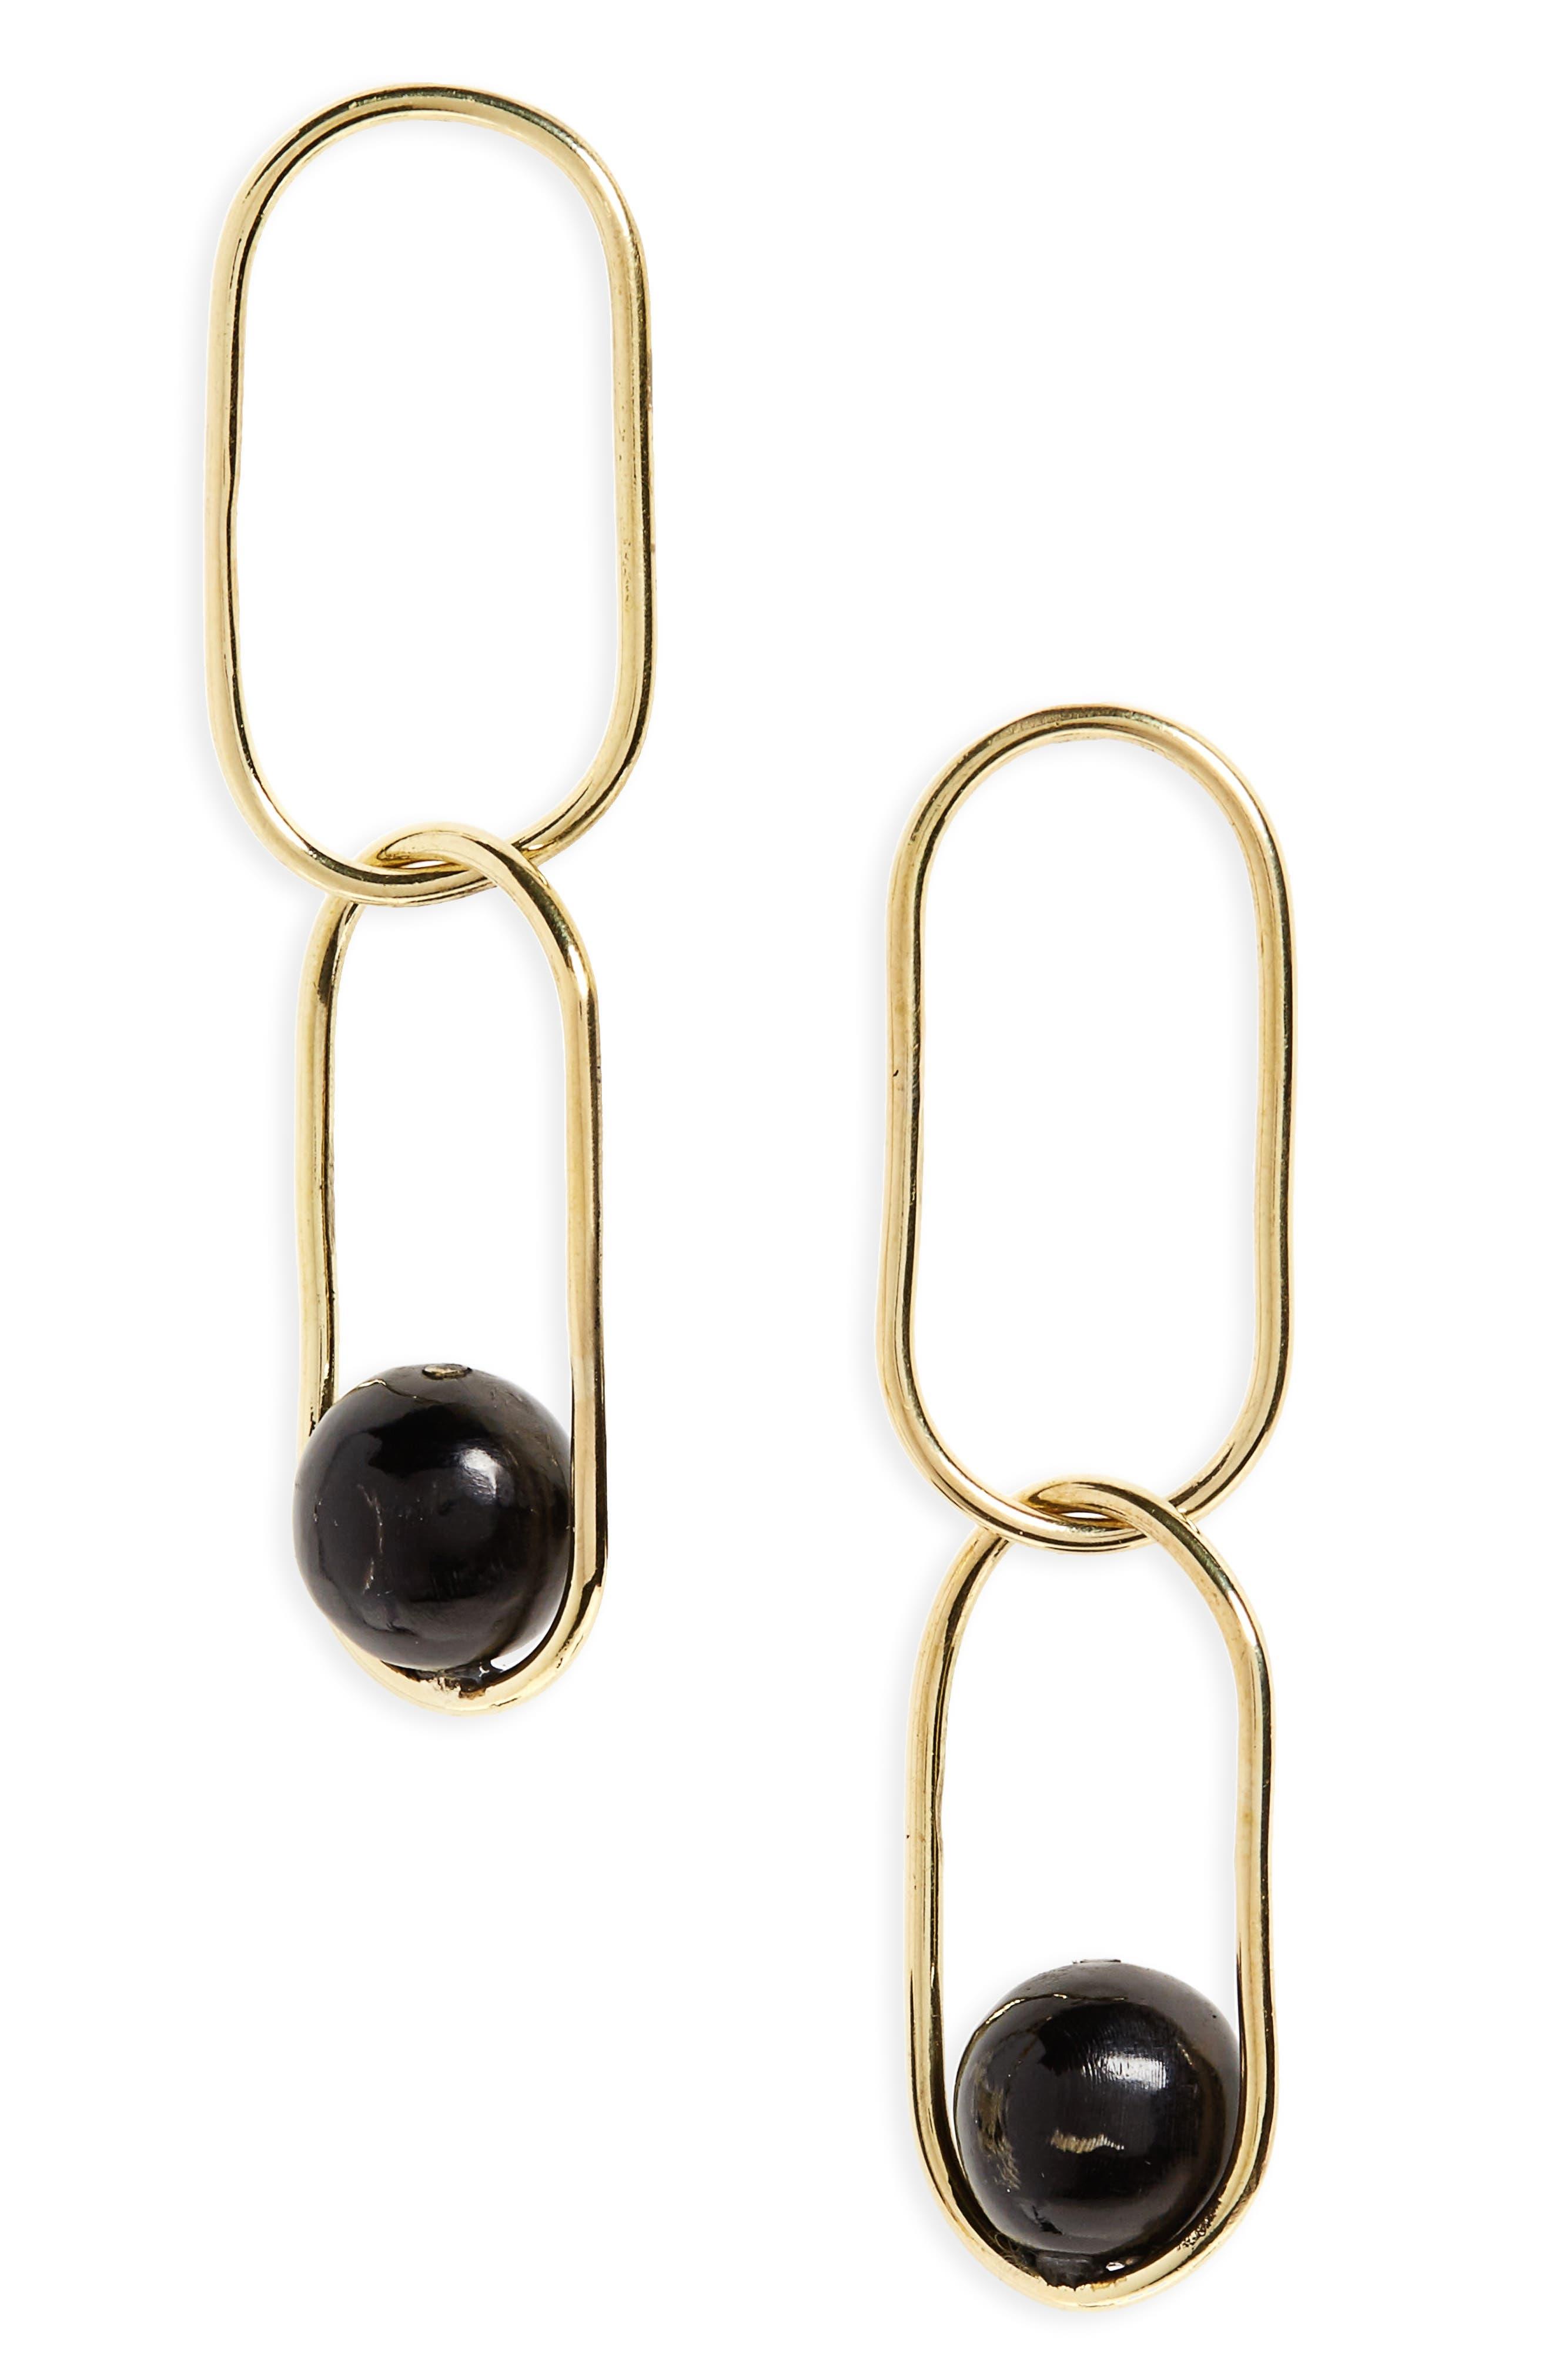 Sawa Link Drop Earrings,                             Main thumbnail 1, color,                             Brass And Black